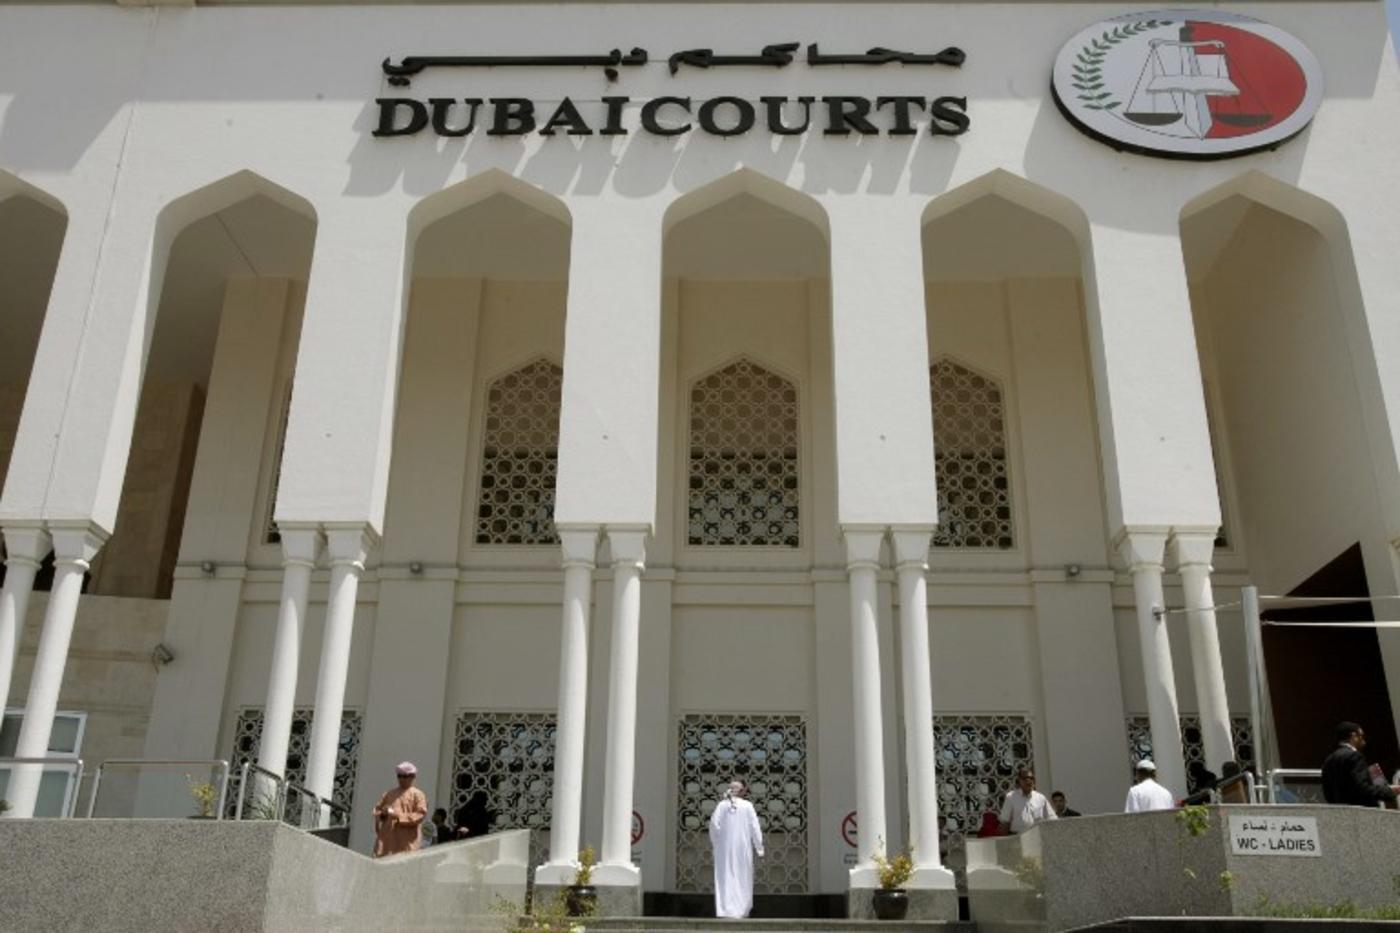 Survivors of UAE torture detail abuse ahead of UN human